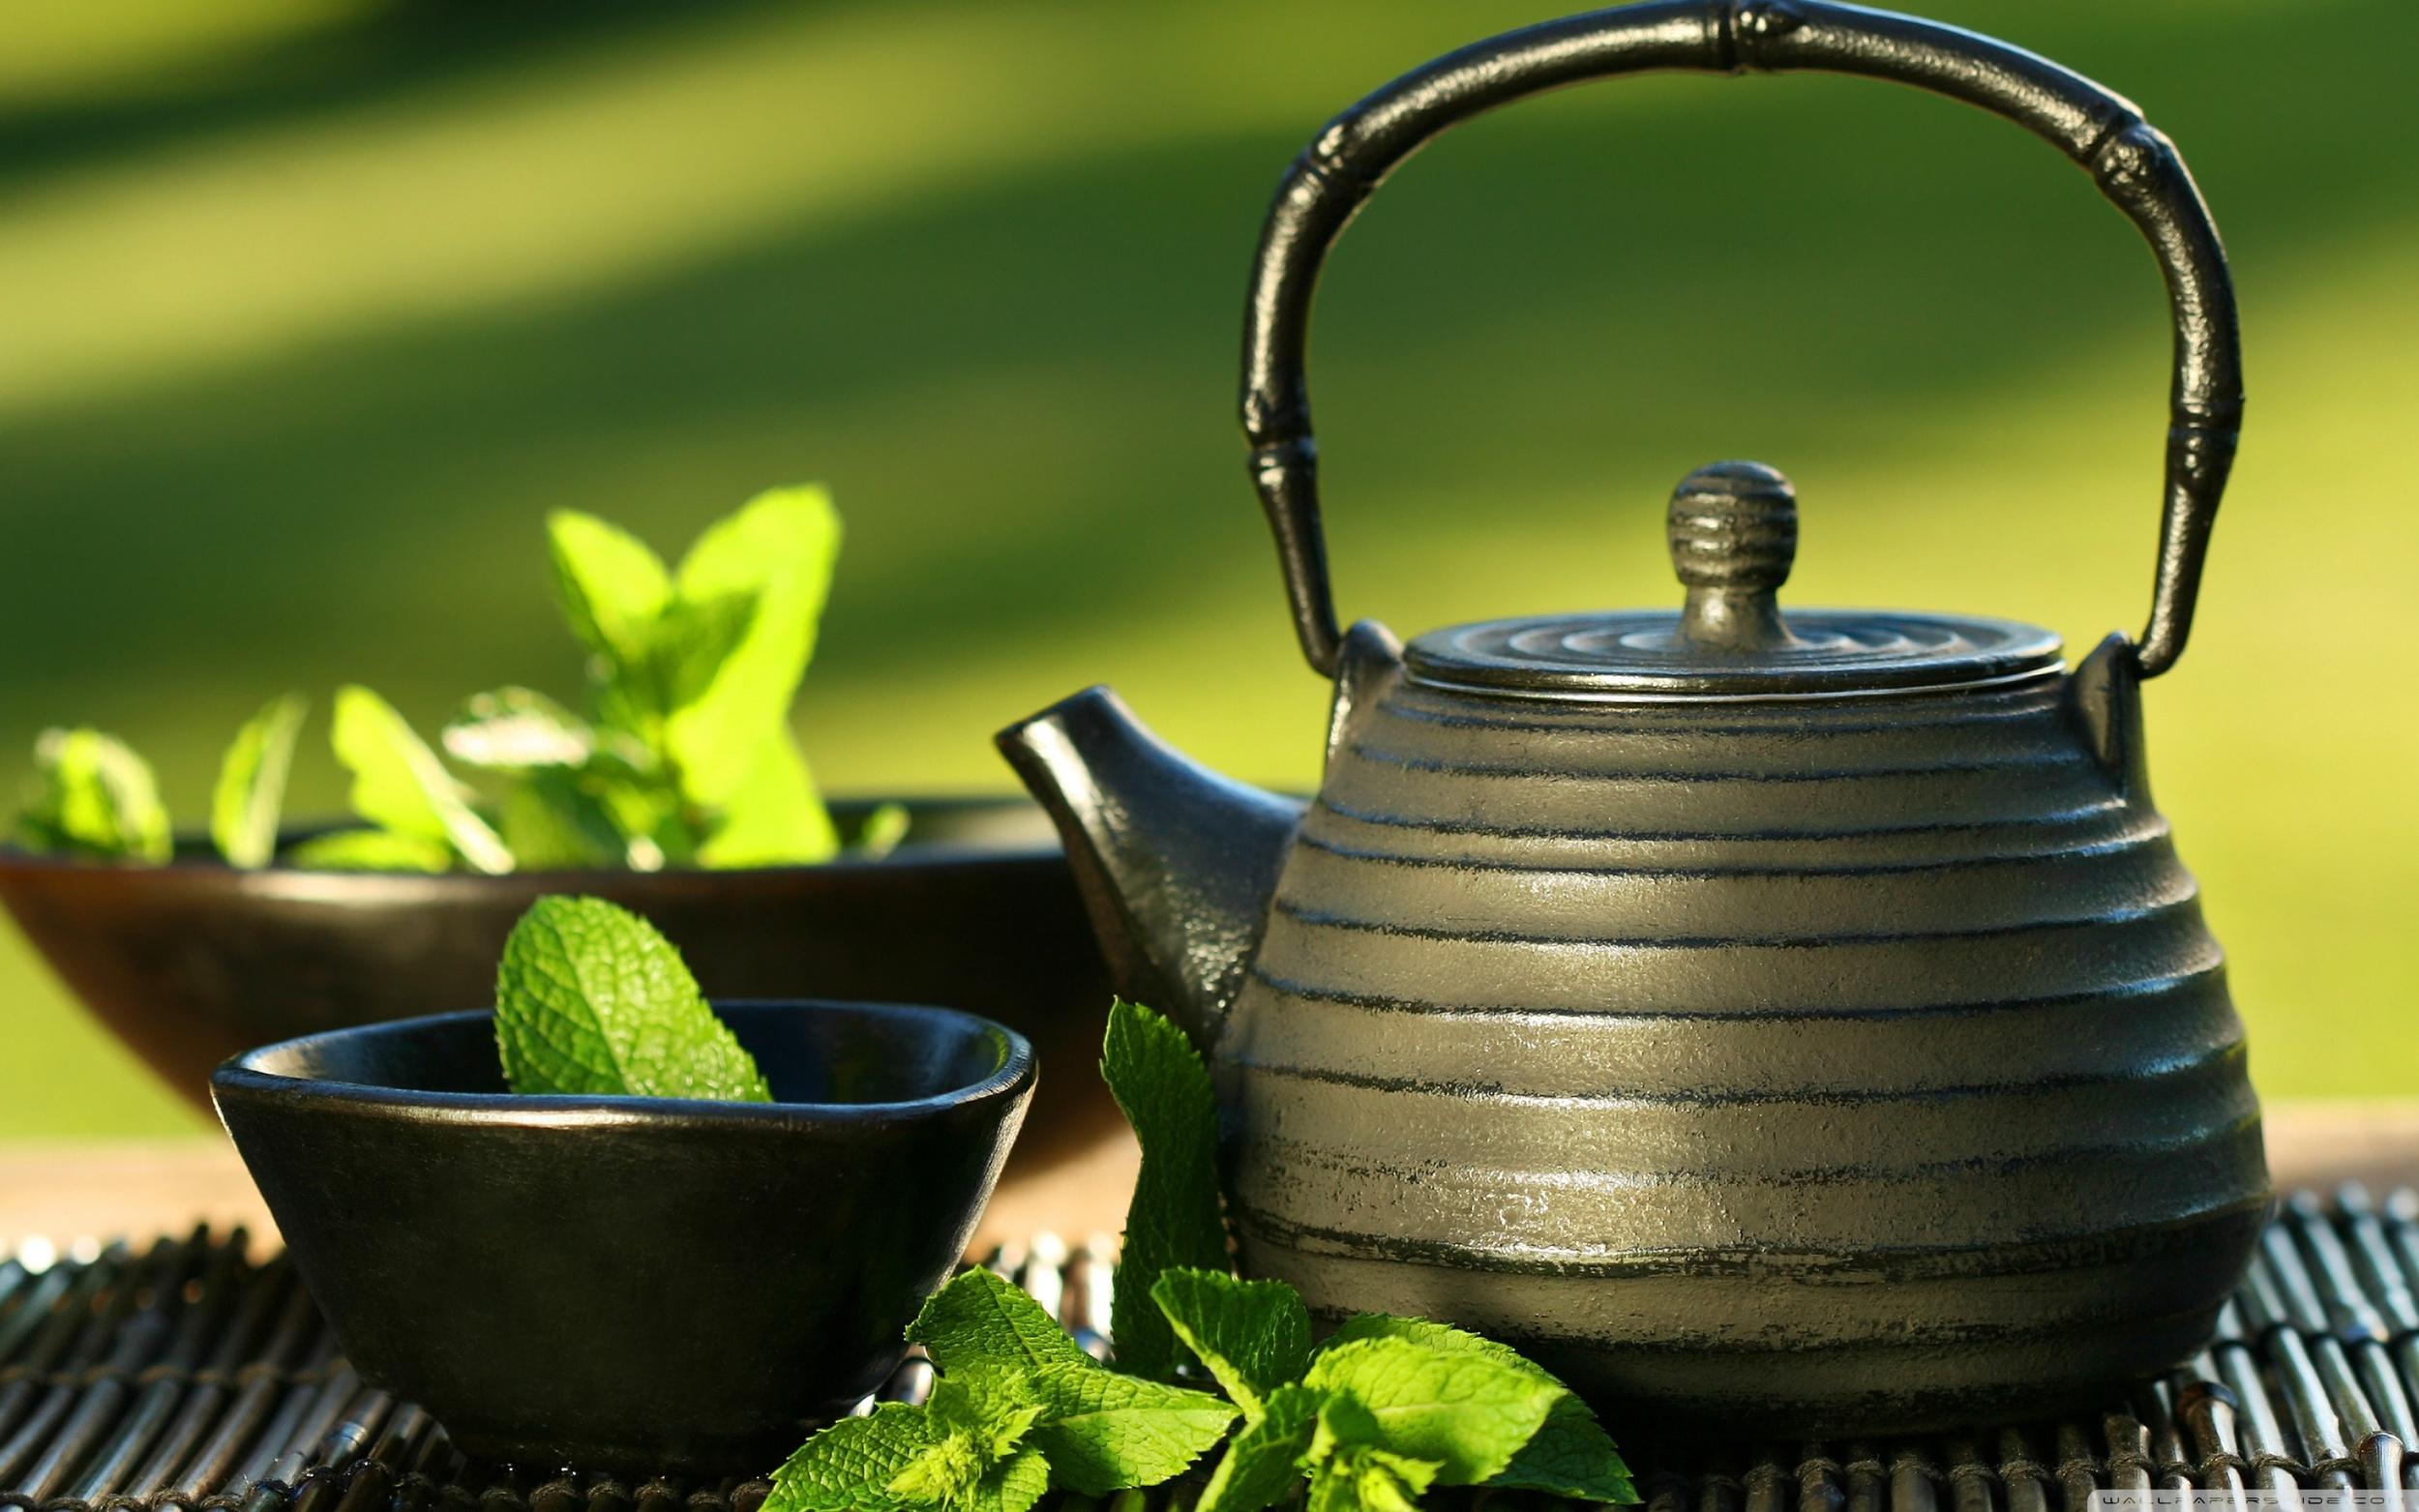 teapot_and_cups-wallpaper-2880x1800.jpg